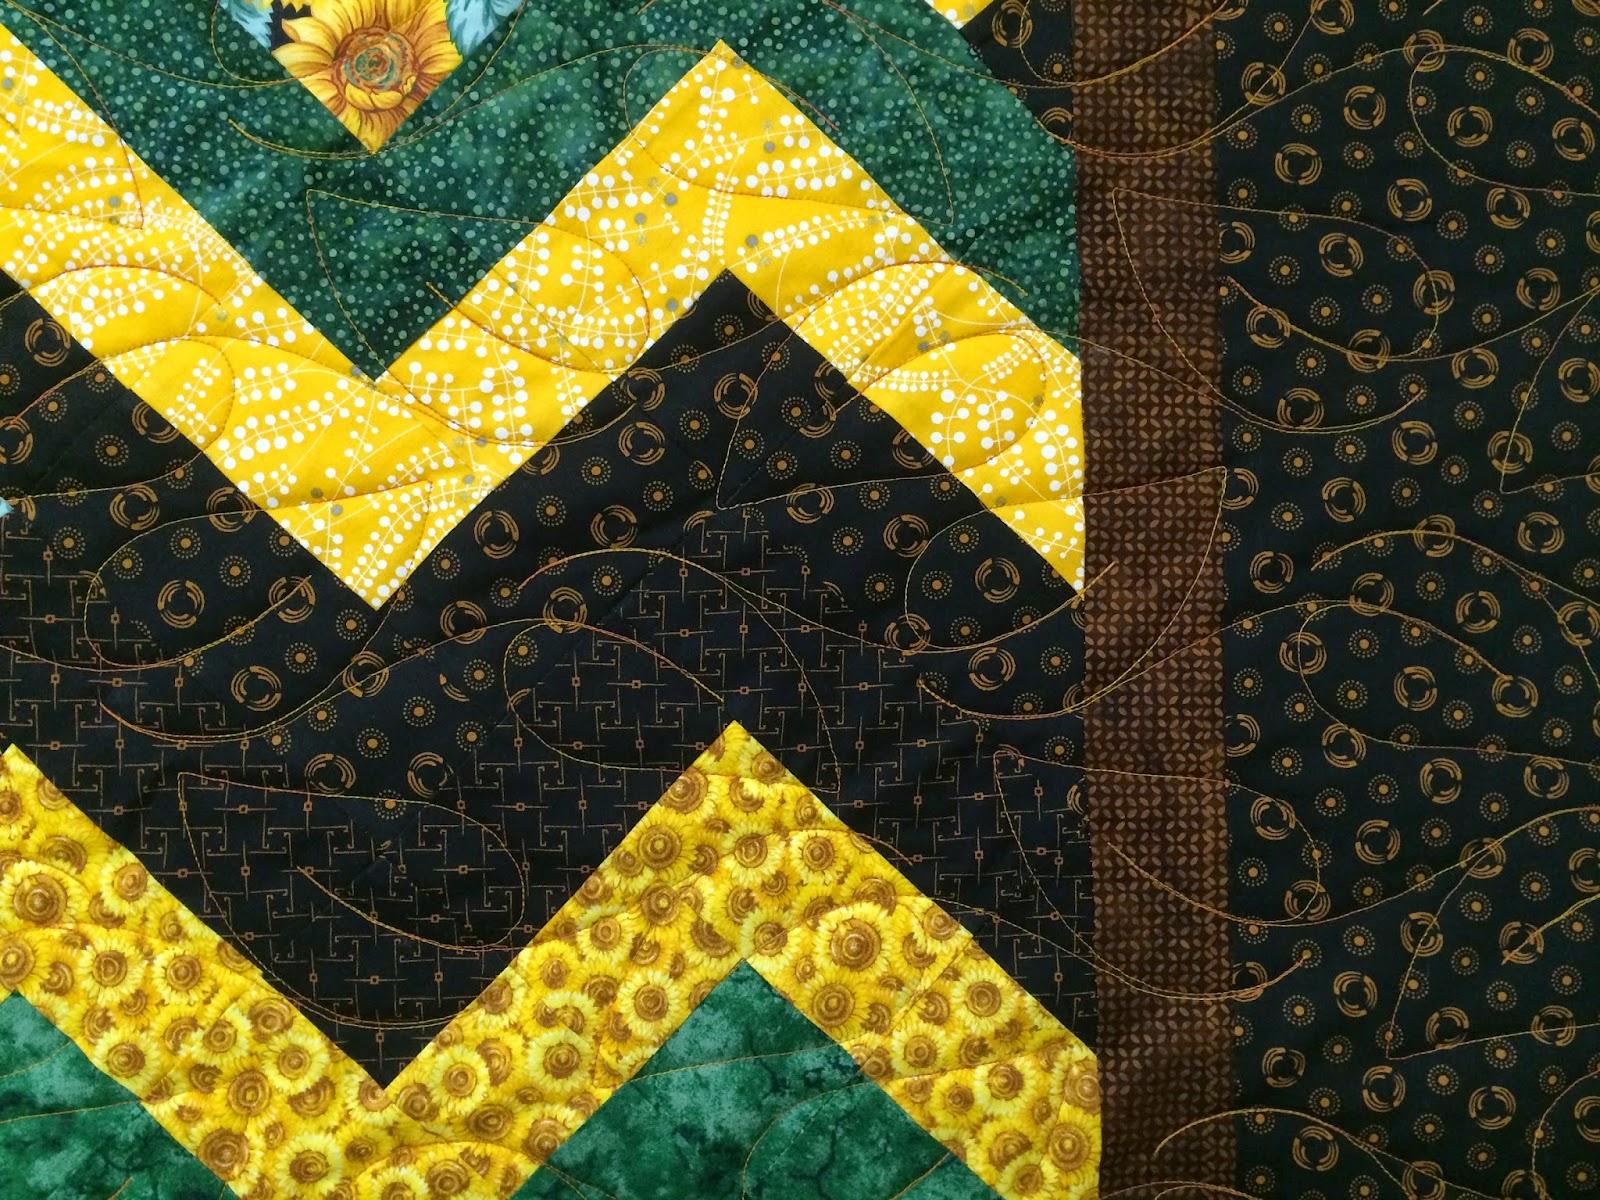 Patricia Boysen's ZigZag Quilt